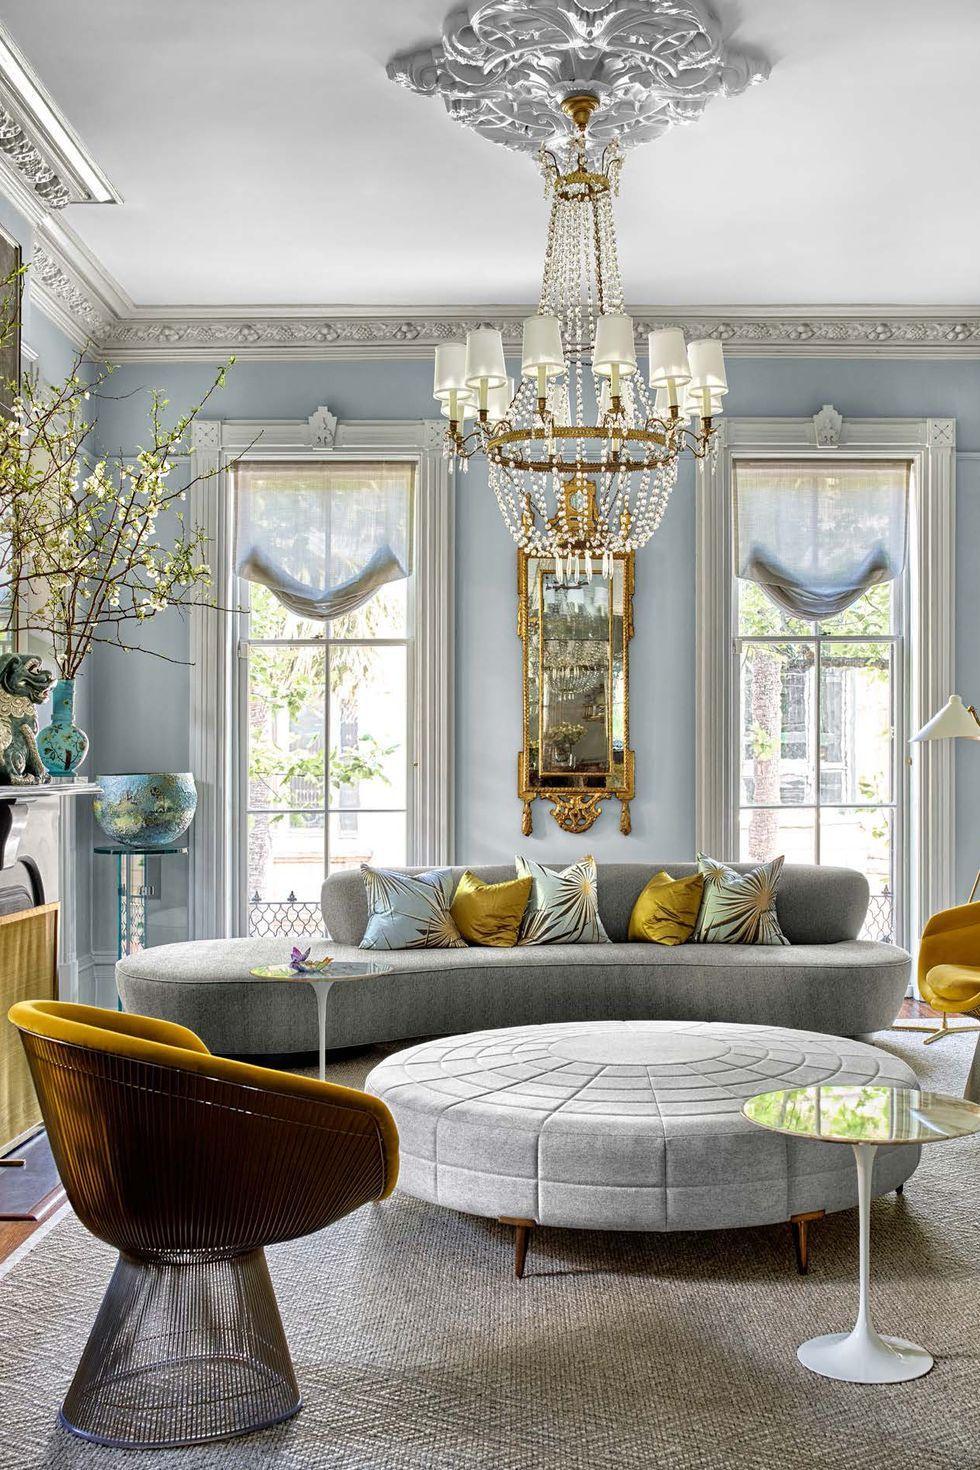 See Inside A Stunning Italianate Townhouse In Savannah Elle